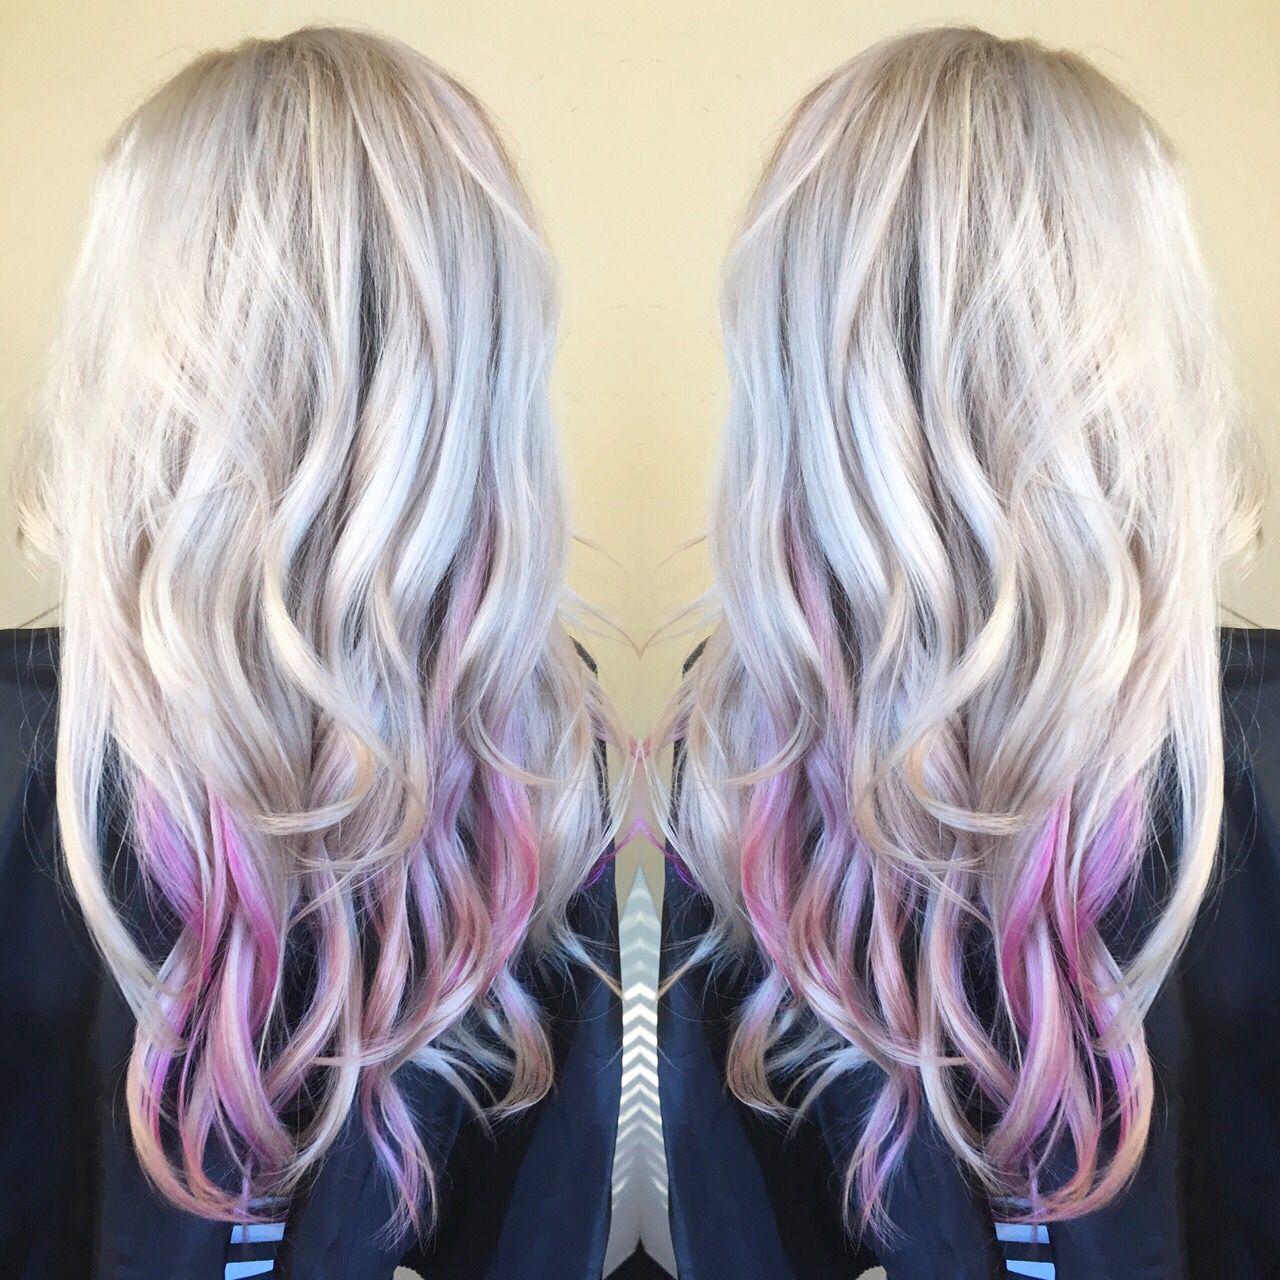 Best Hairstyle For One Shoulder Wedding Dress Pink Blonde Hair Platinum Blonde Hair Peekaboo Hair